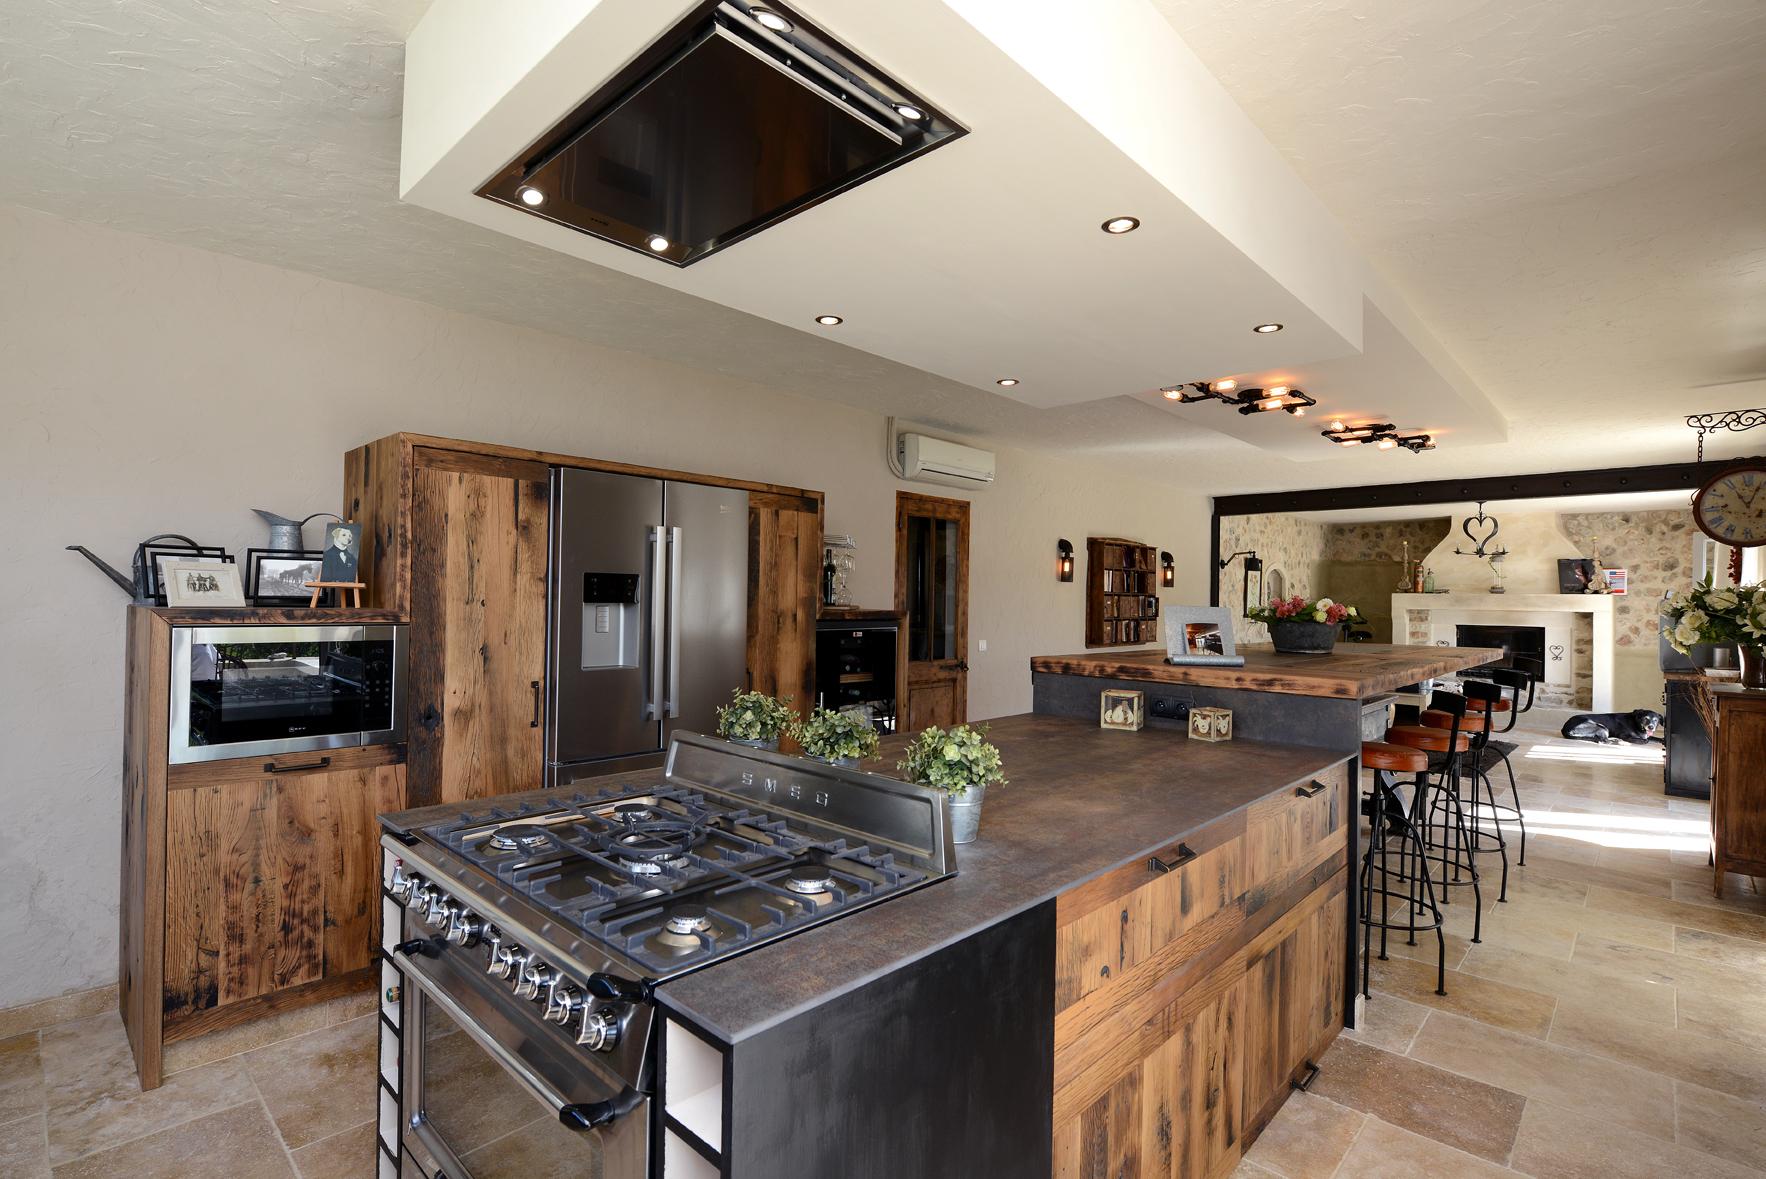 cuisine esprit industriel. Black Bedroom Furniture Sets. Home Design Ideas